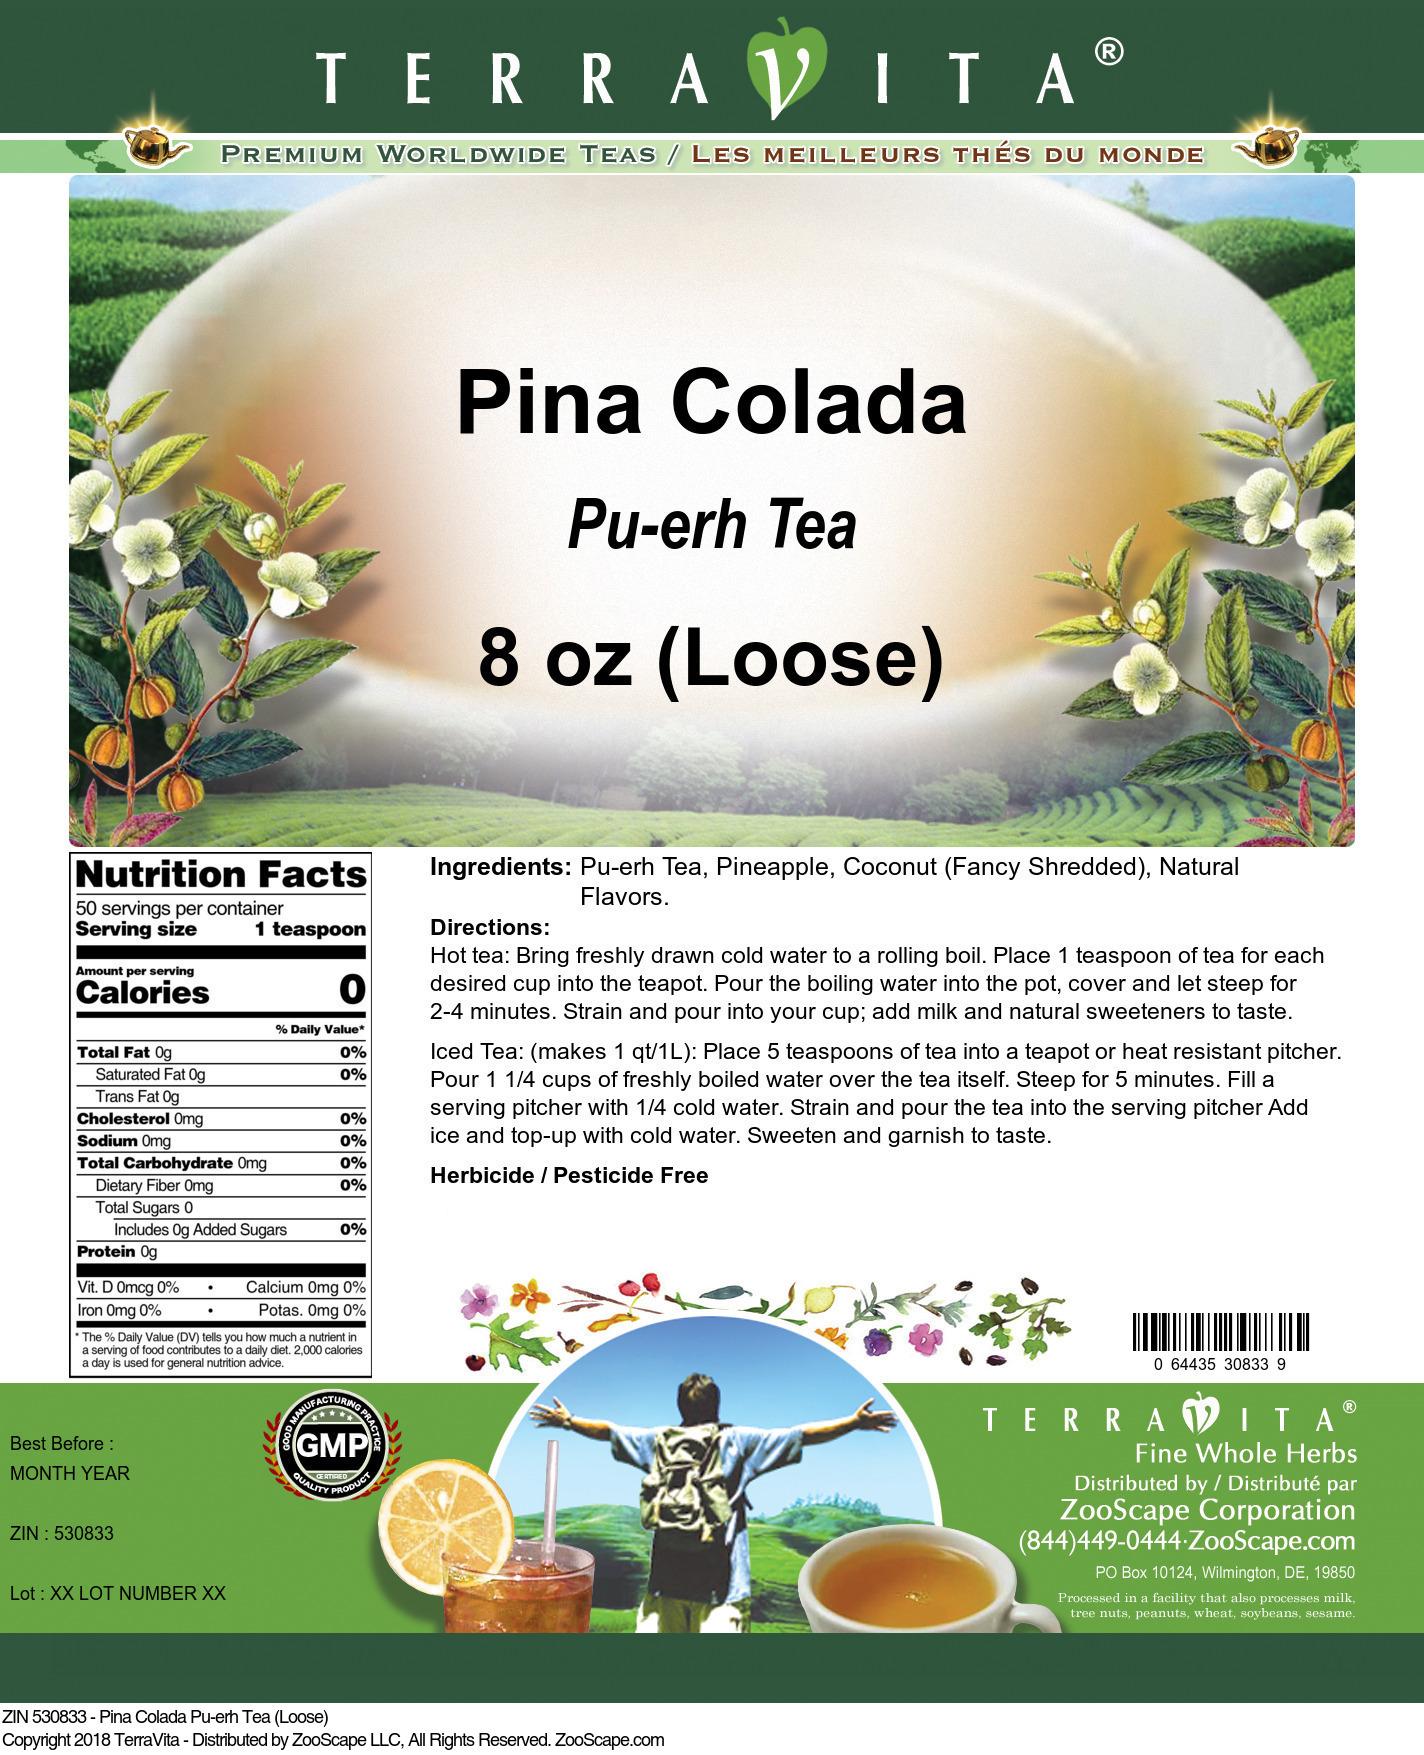 Pina Colada Pu-erh Tea (Loose)